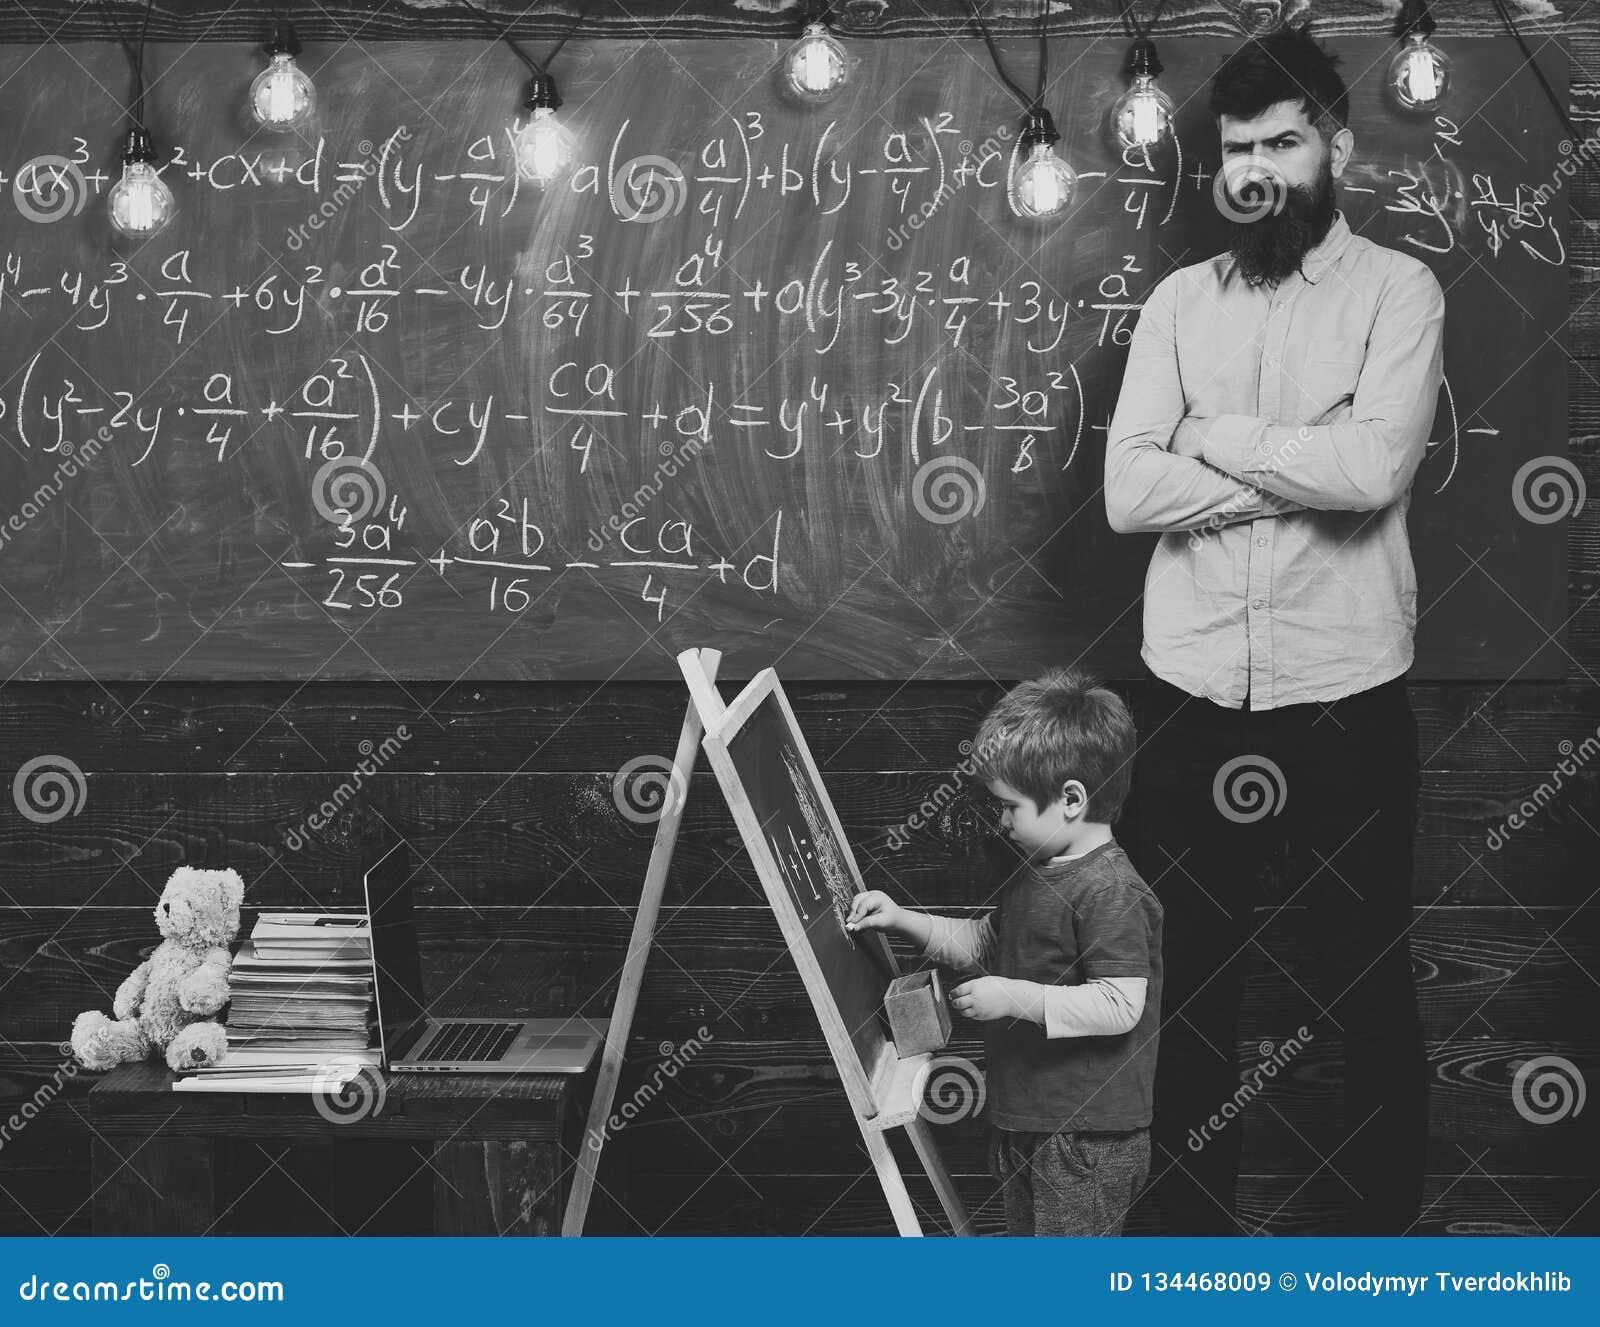 Strict math teacher checking pupil s work. Blond schoolboy solving equation at chalkboard. Preschool education concept